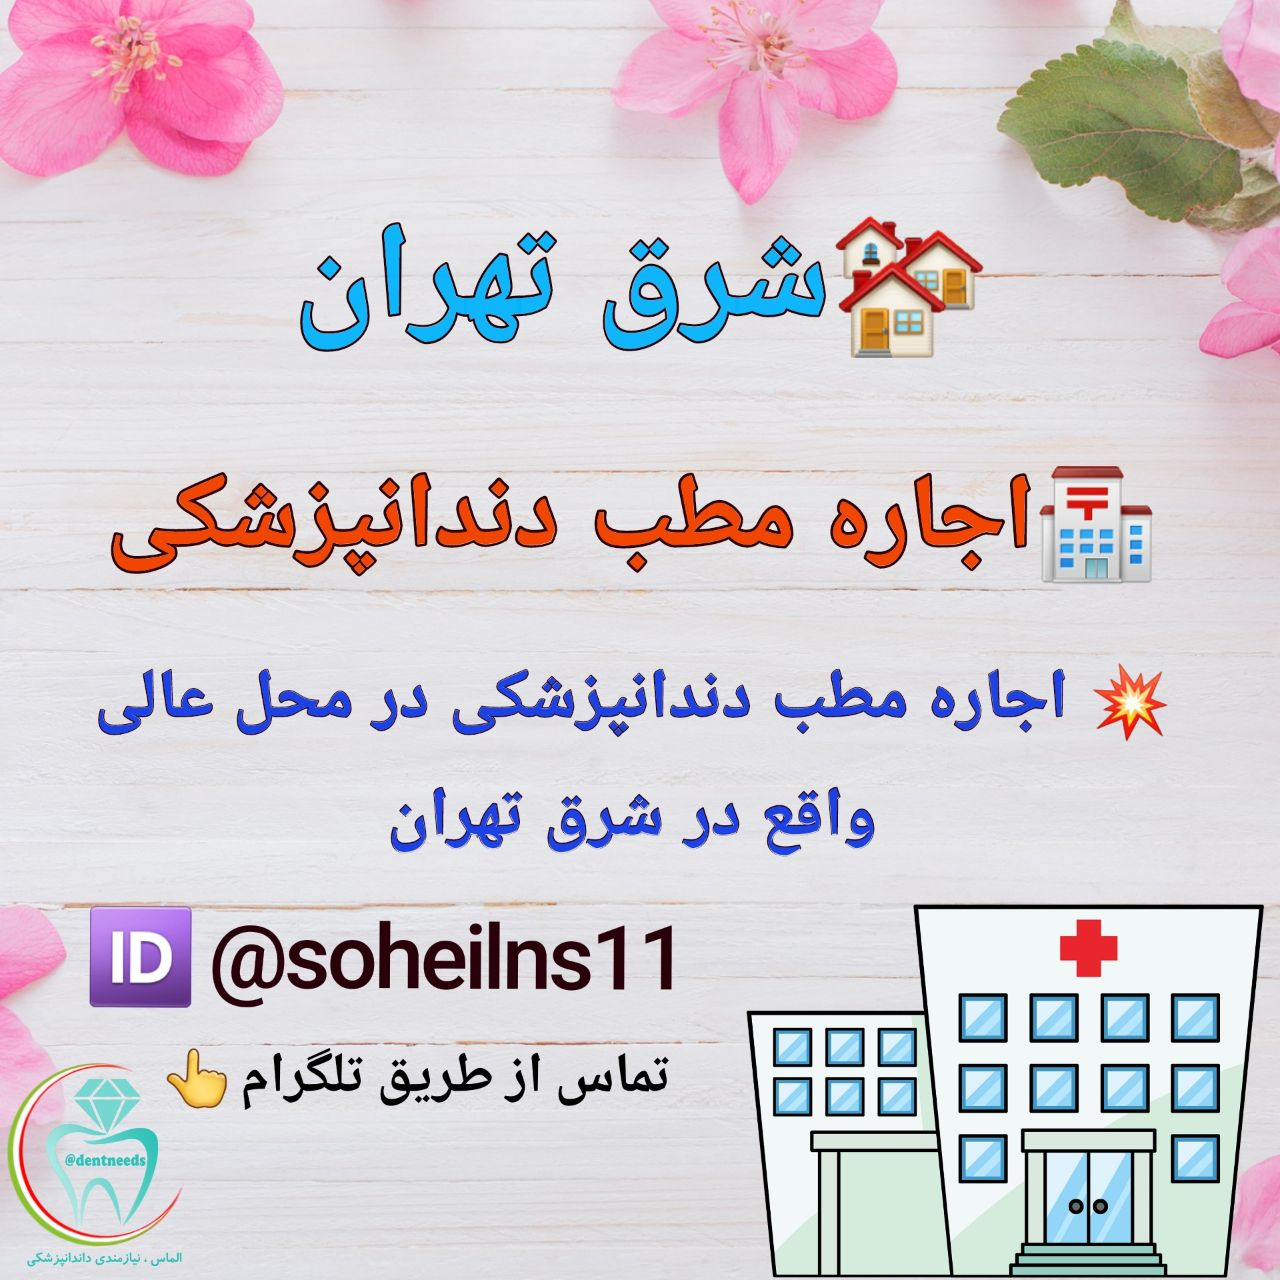 شرق تهران: اجاره مطب دندانپزشکی